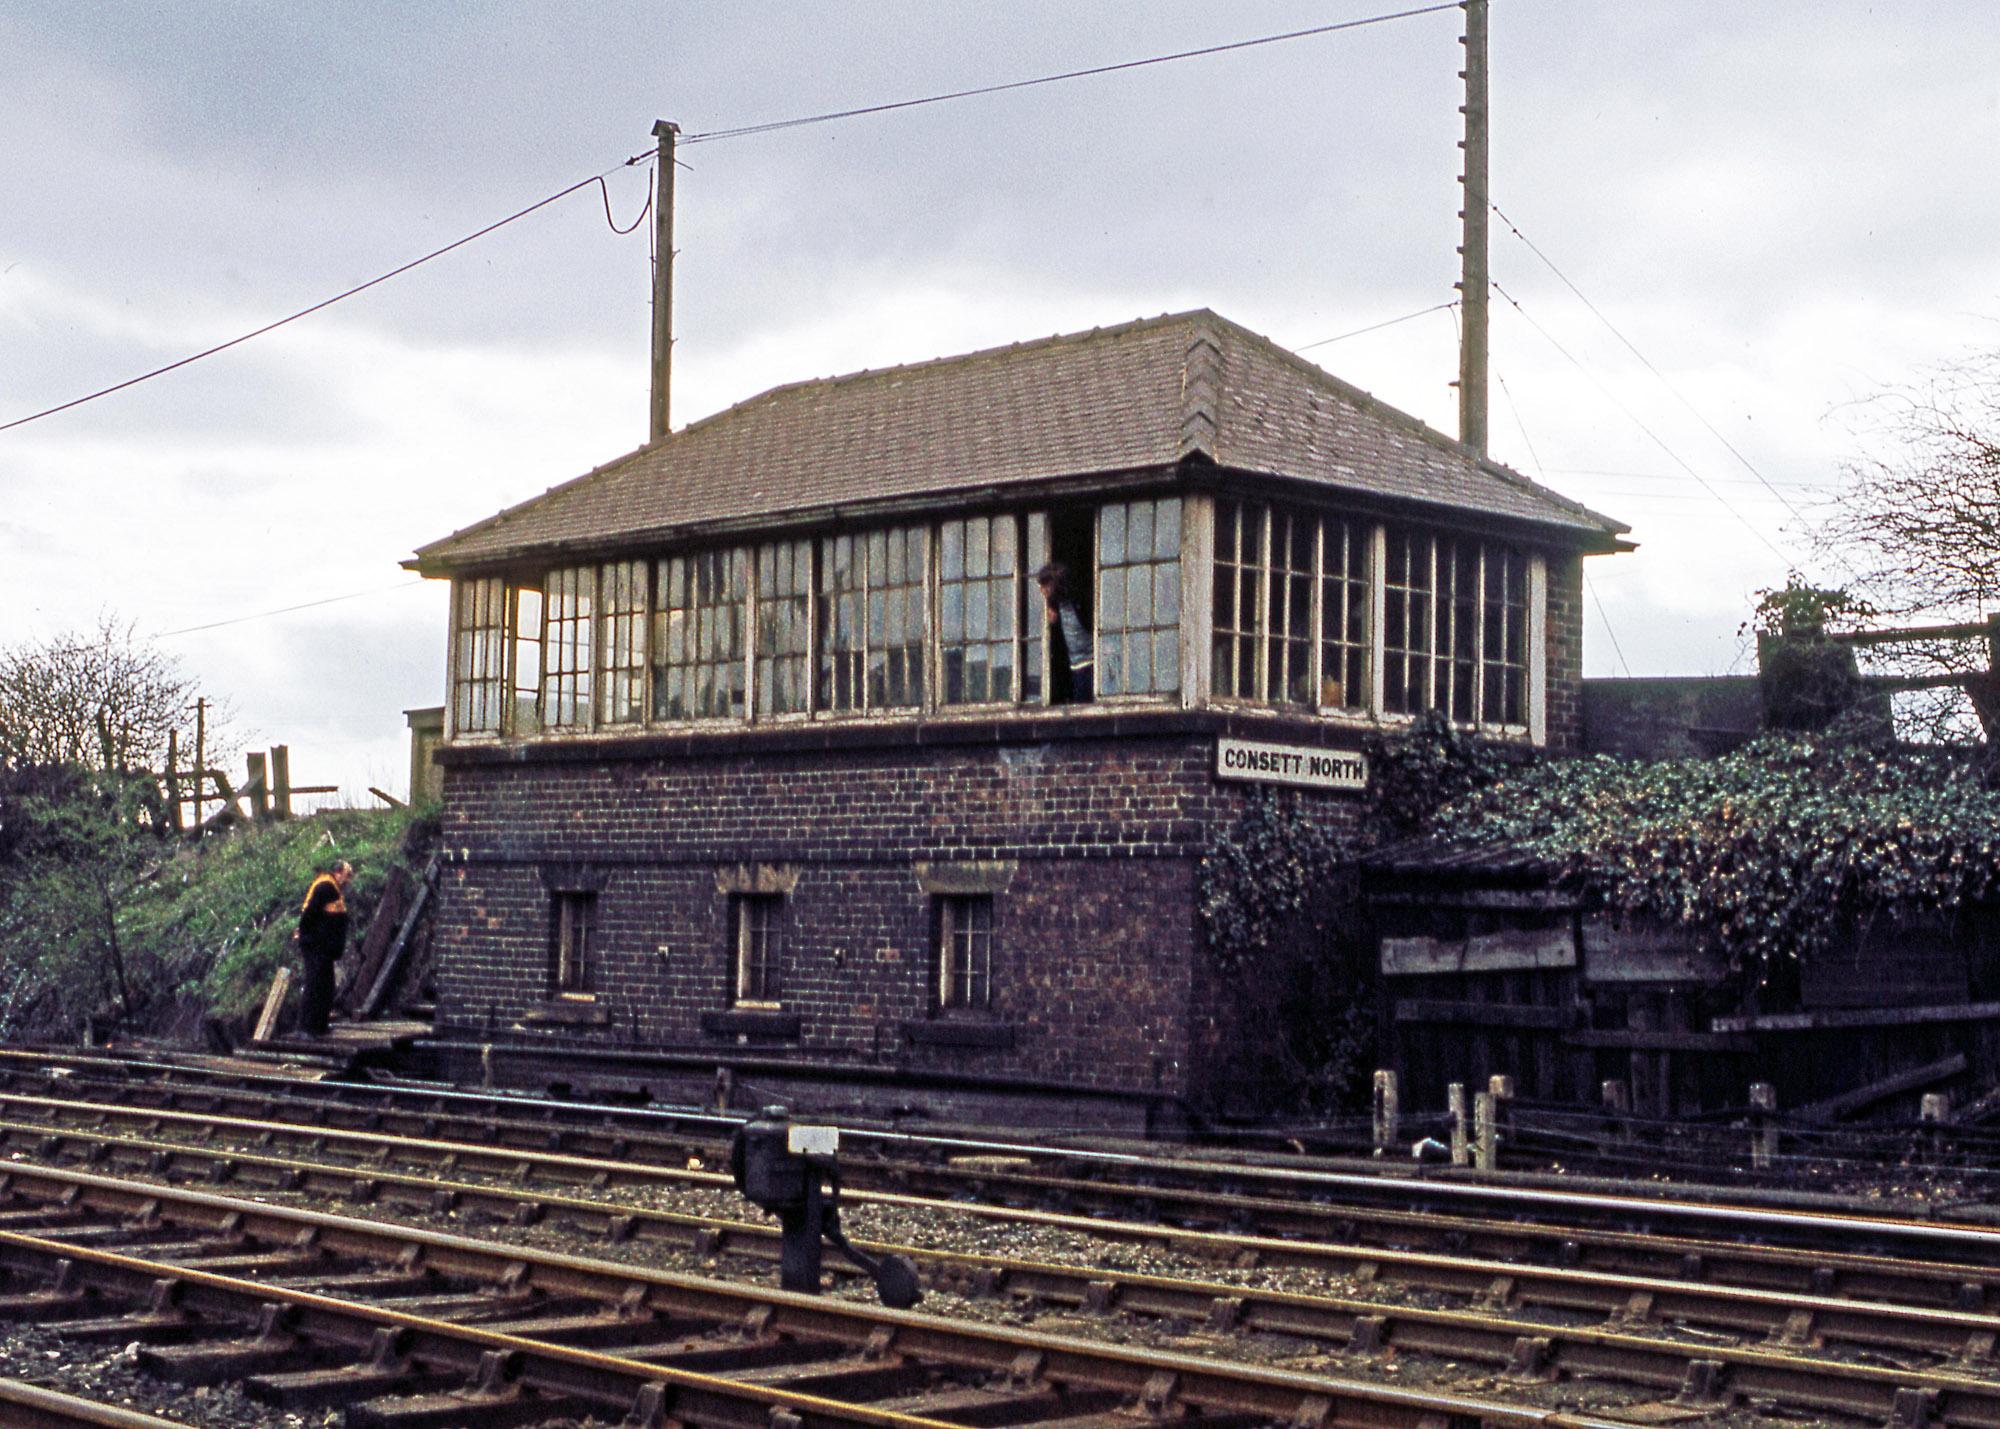 Consett North Signal Box 1 12 May 1979. Photo copyright Stephen McGahon